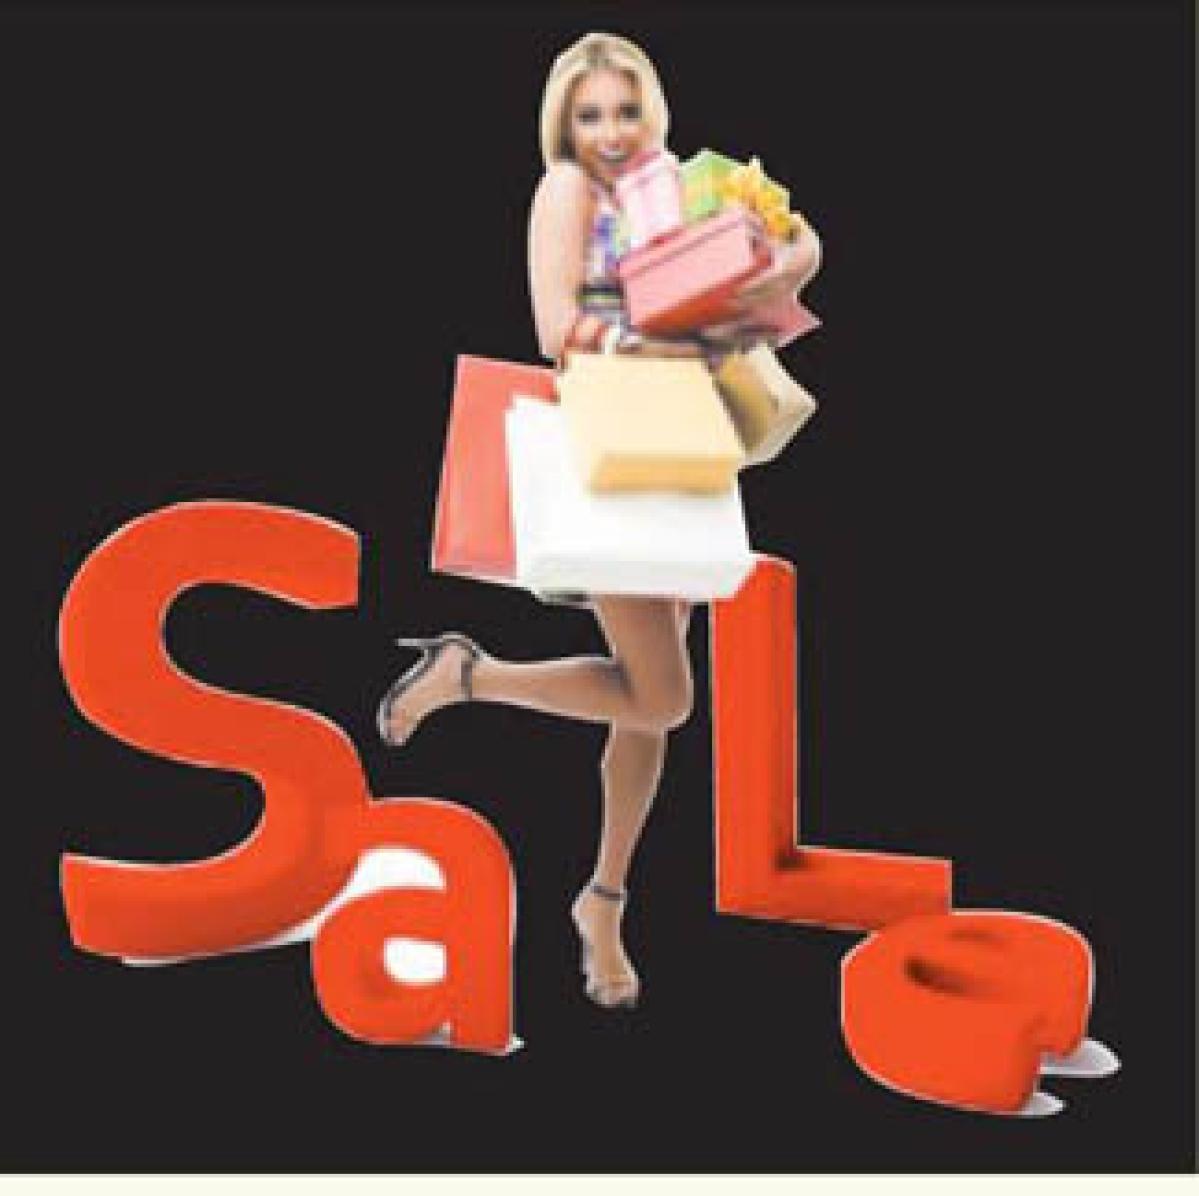 End of season Sale— shopper's delight or nightmare